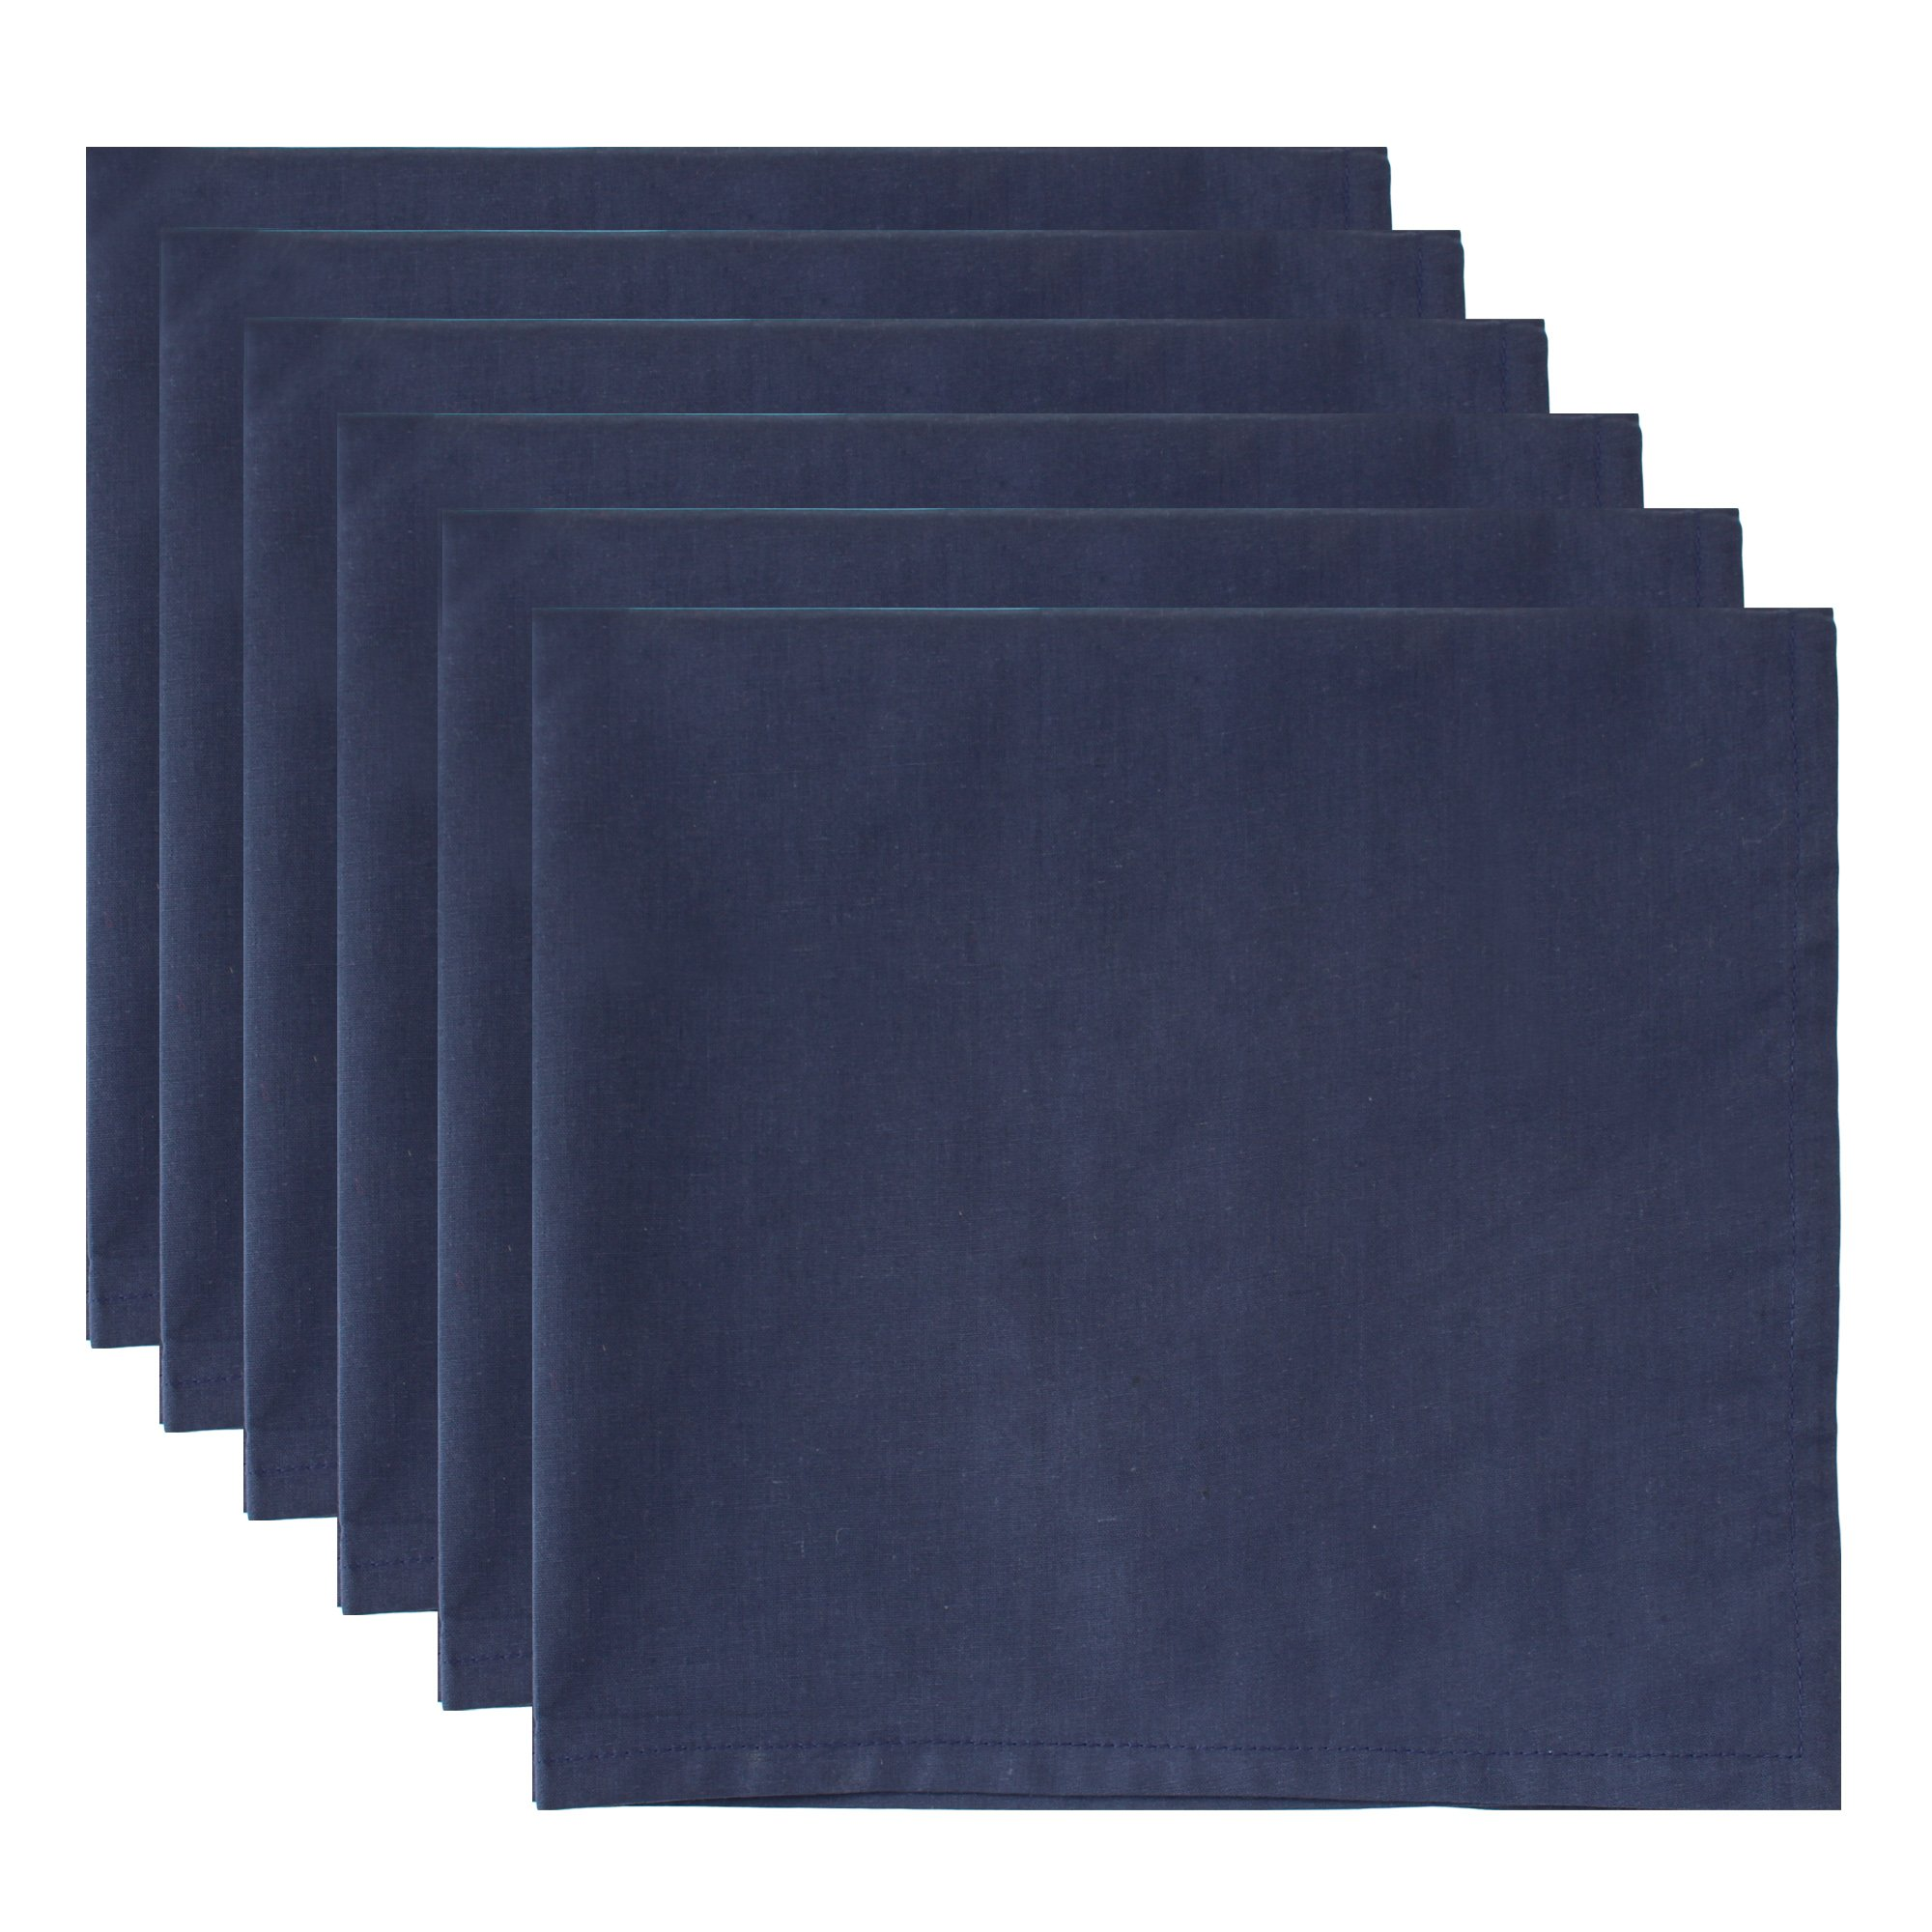 ITOS365 100% Cotton, Oversized Basic Everyday 21'' x 21'' Napkin, Set of 6, Navy Blue by ITOS365